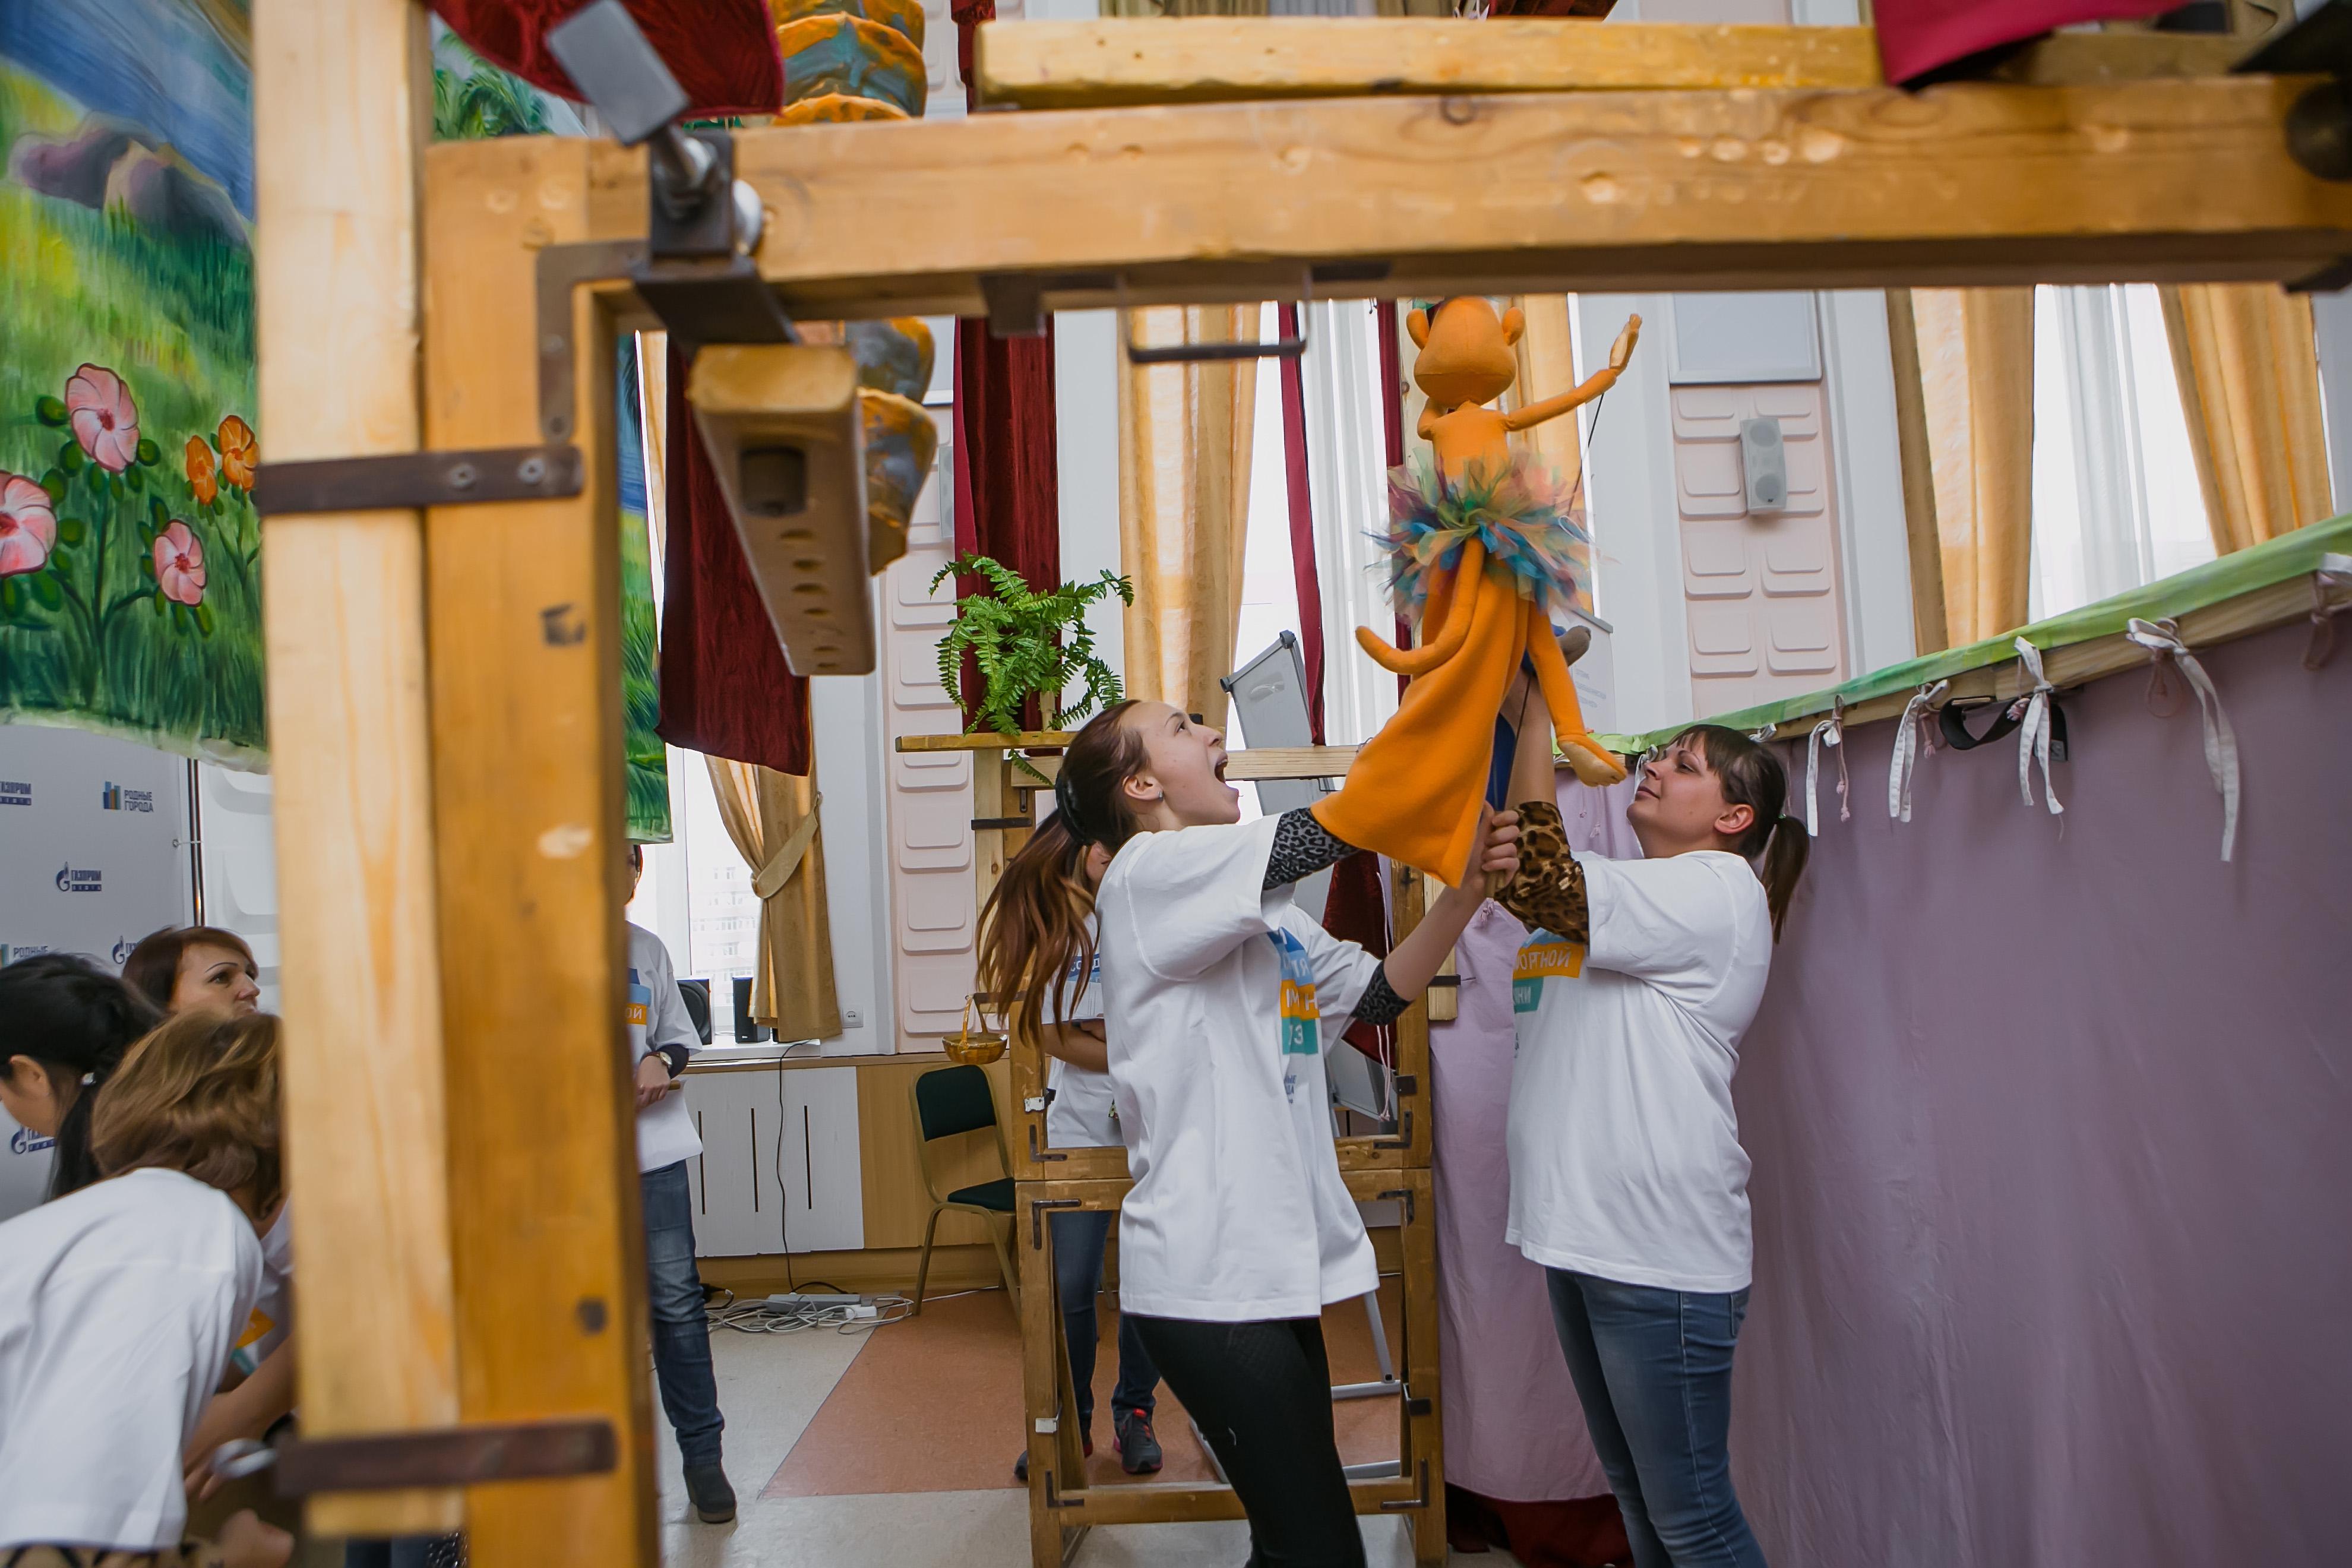 Омские волонтеры предприятий «Газпром нефти» стали артистами «Доброго театра»